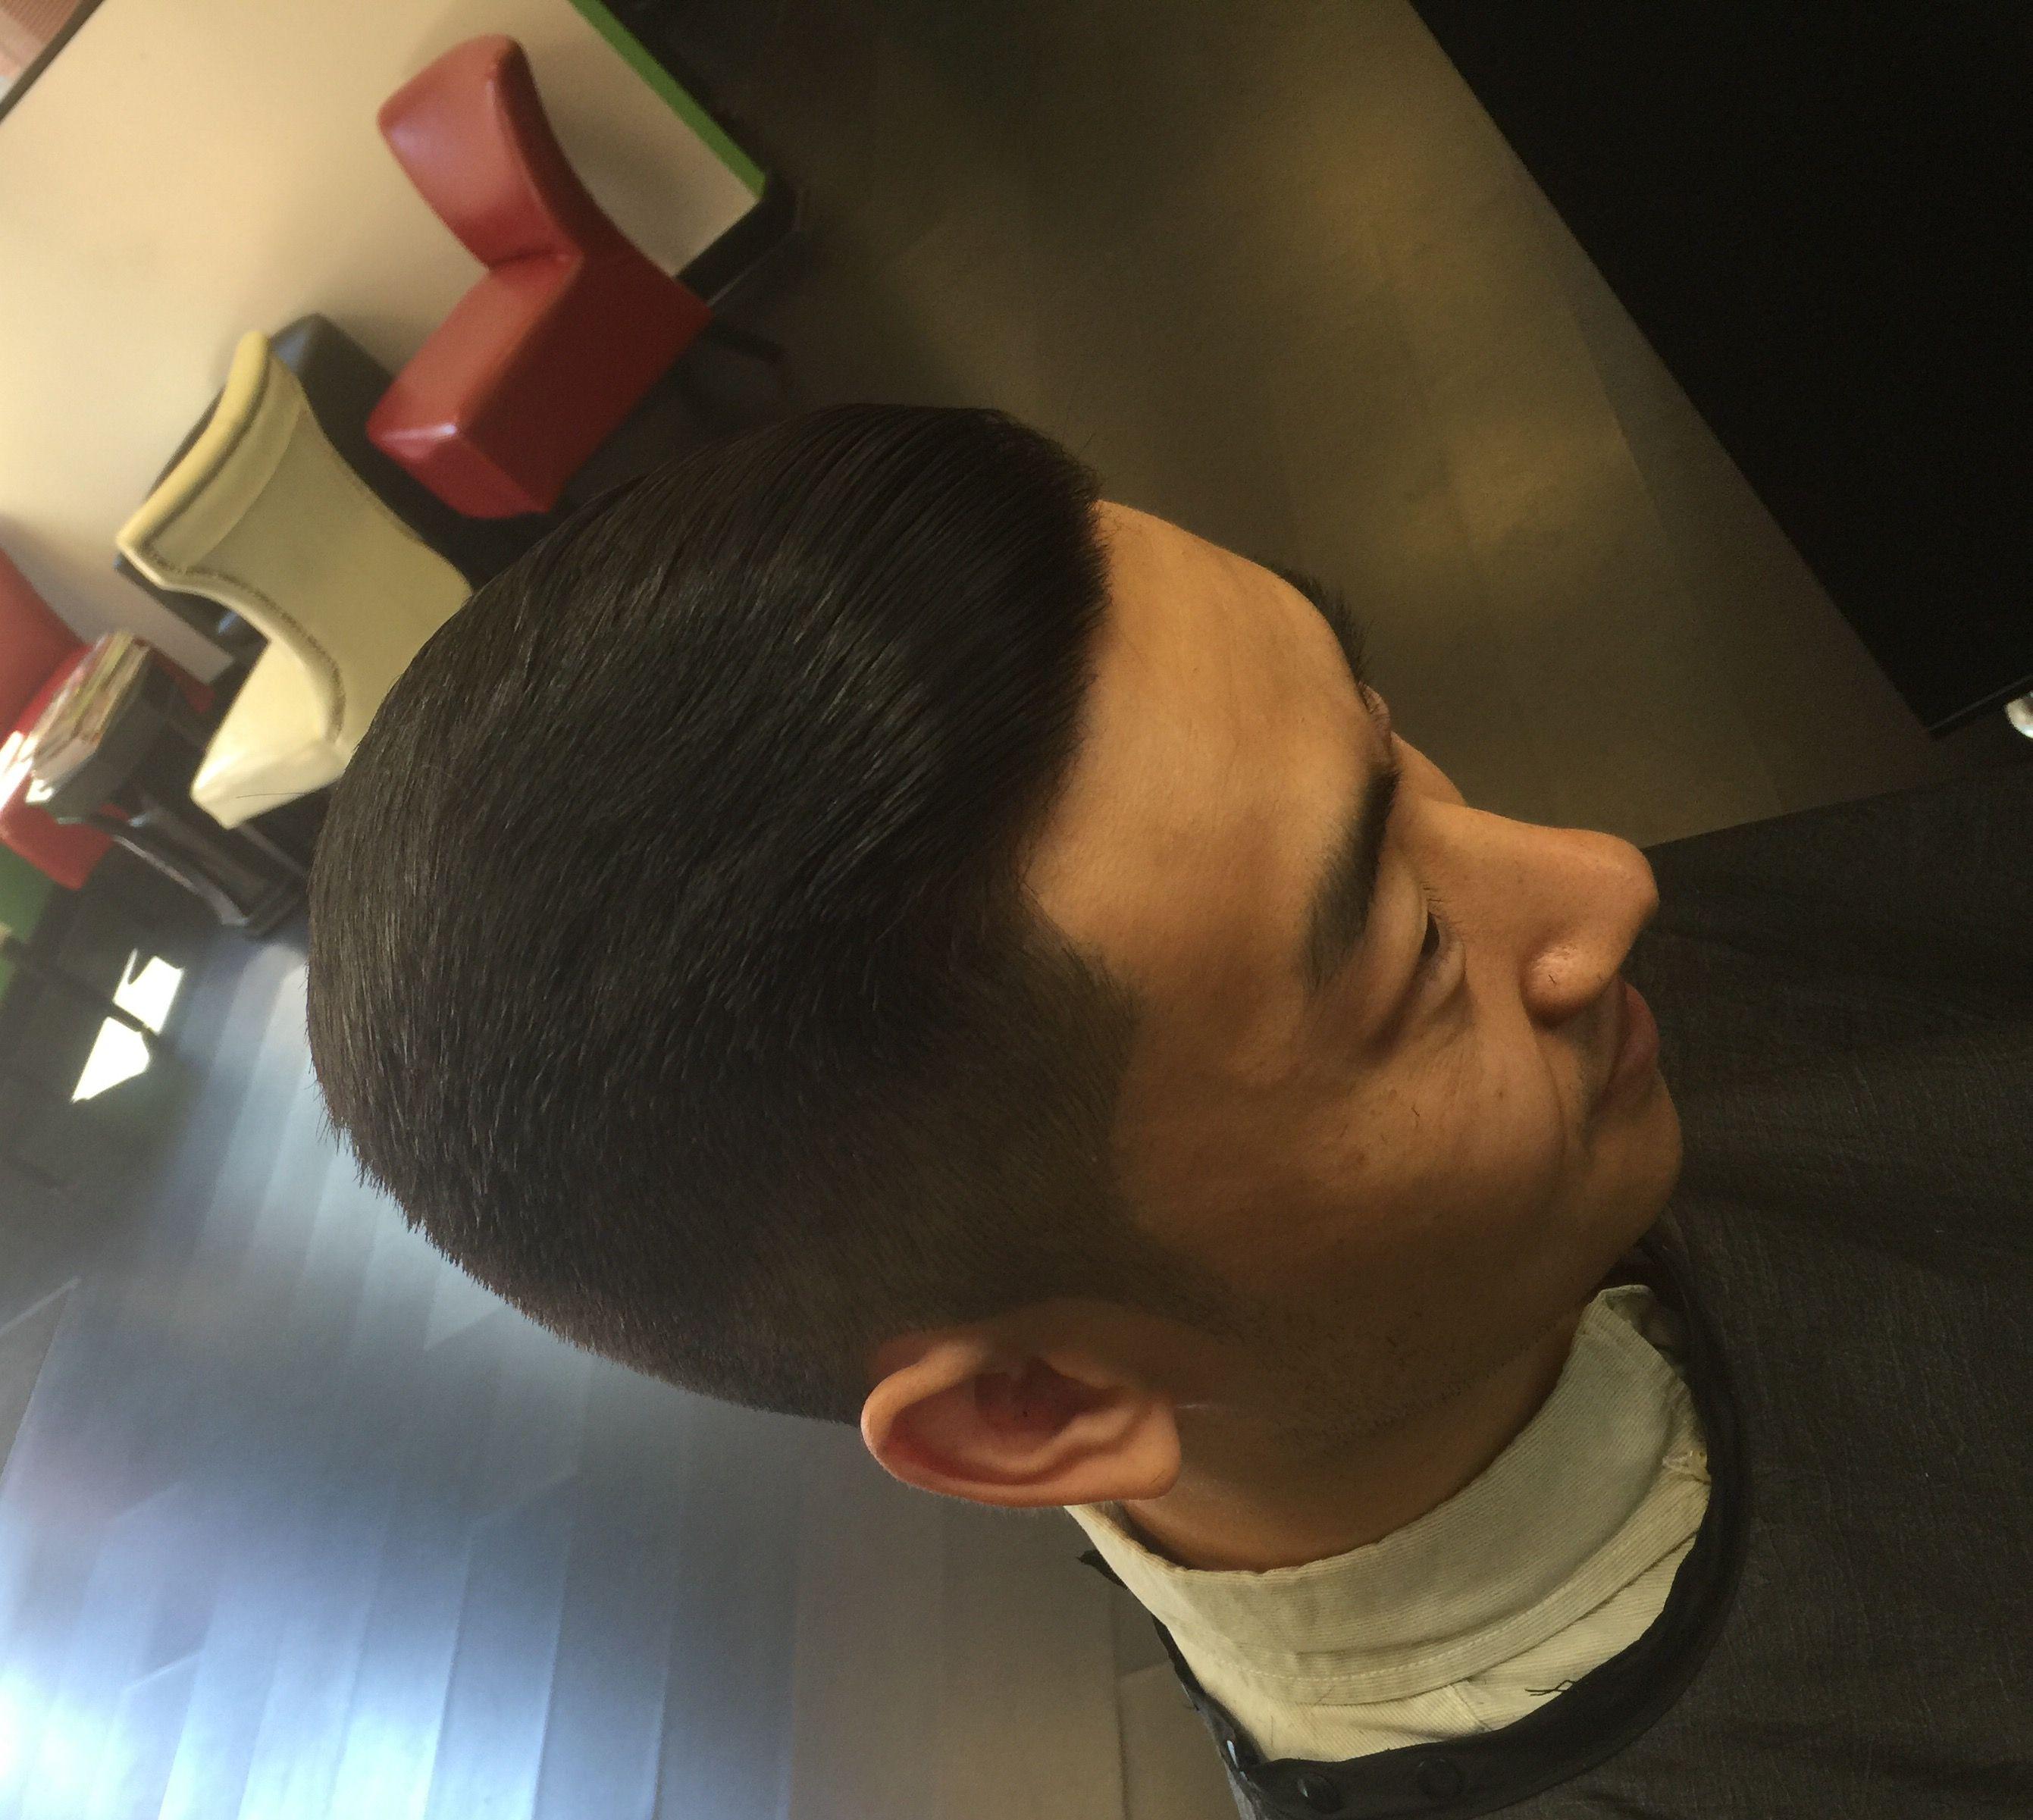 Haircuts for men las vegas pin by dfrancisco on menus best haircut  pinterest  haircuts